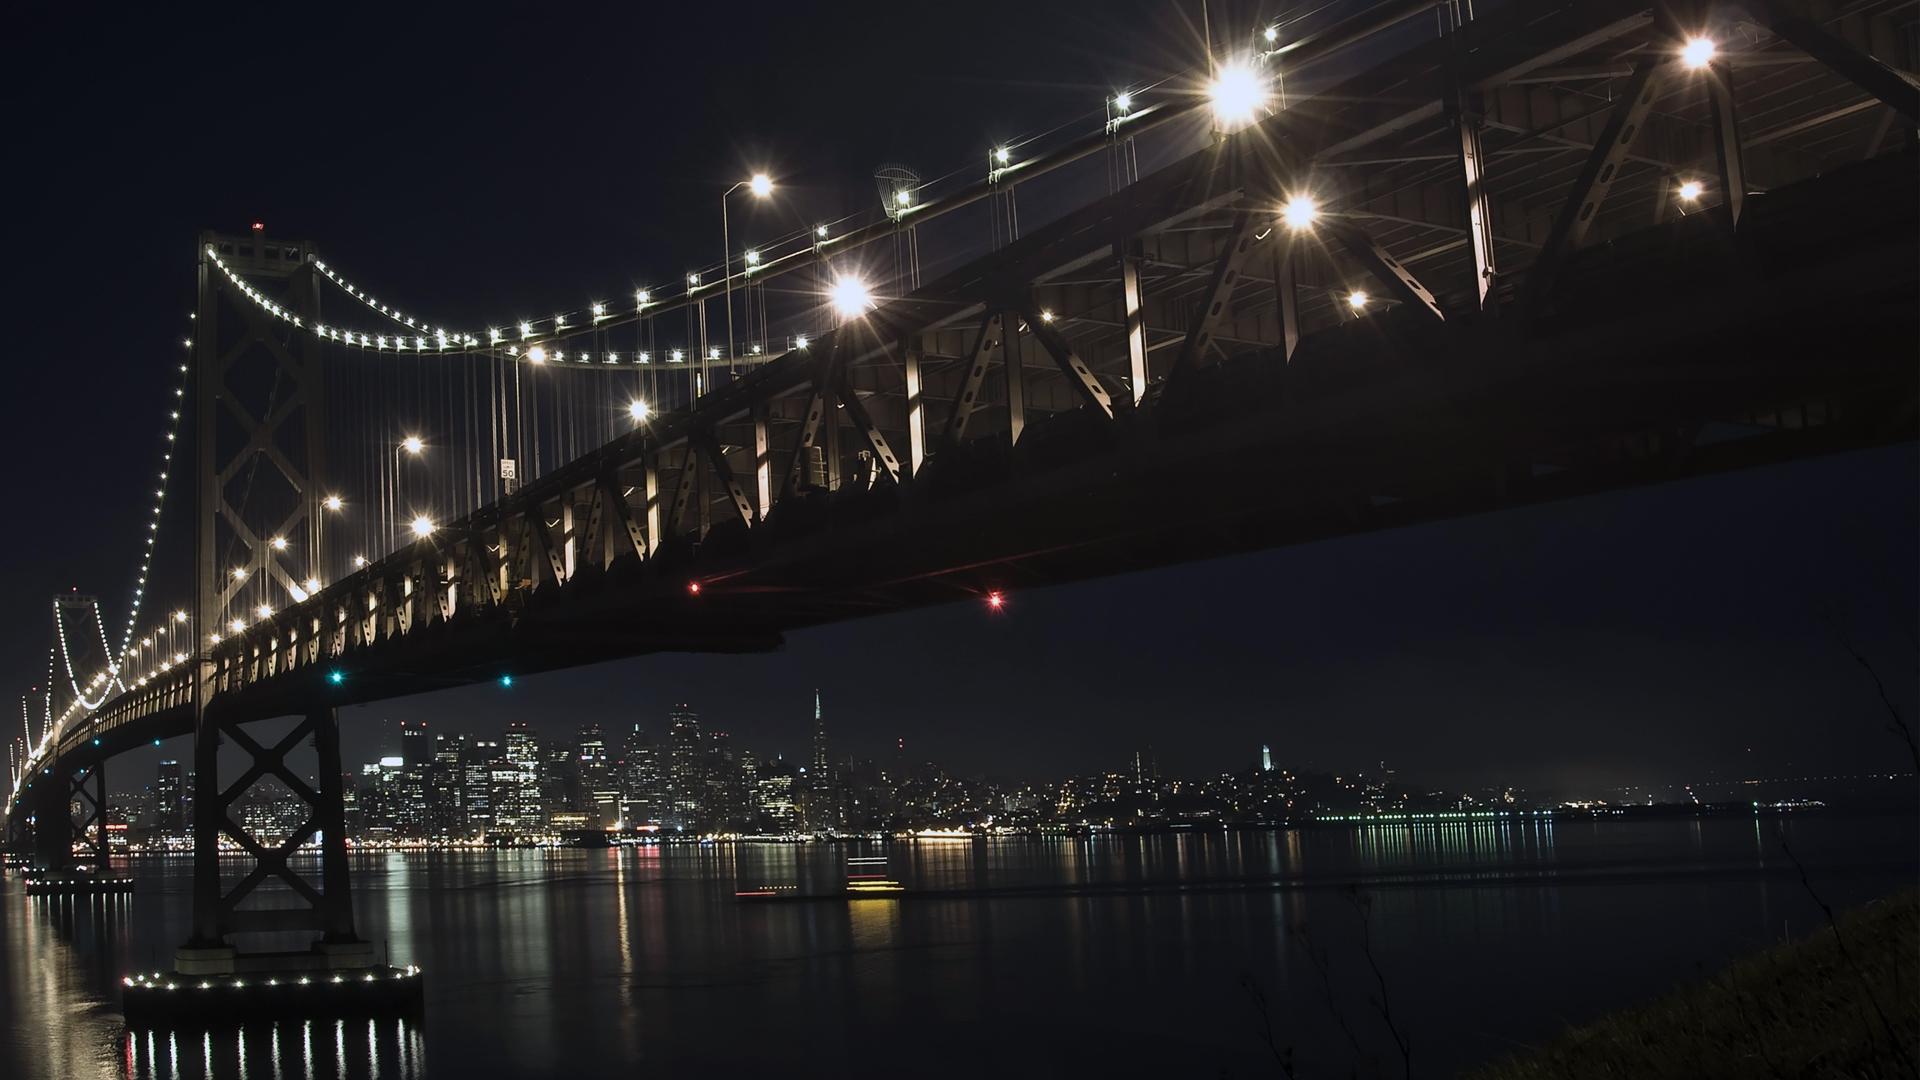 Free download Hd 1920x1080 City Bridge At Night Desktop